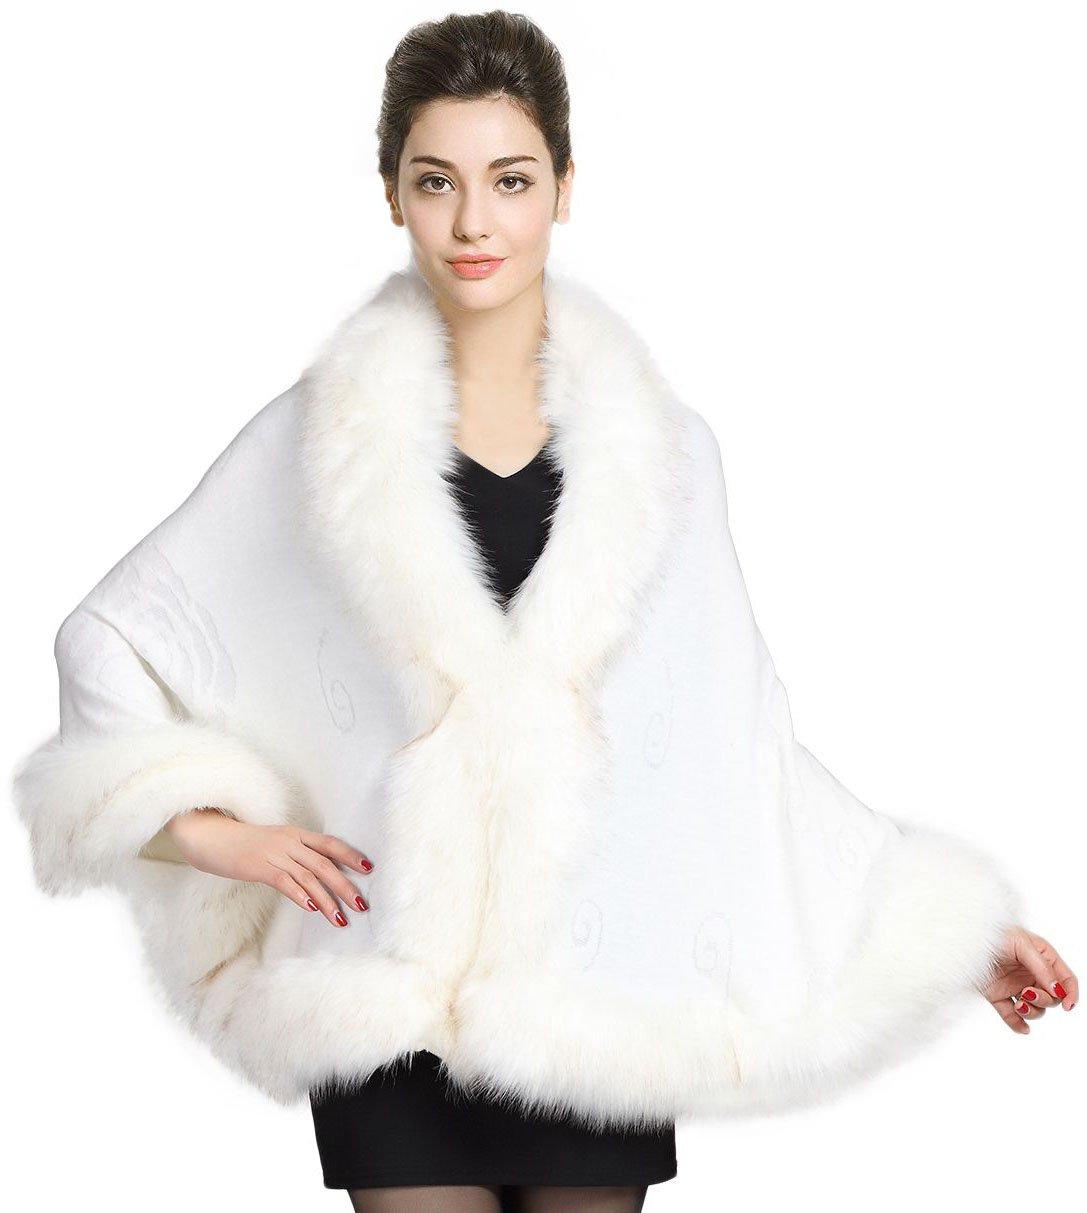 Faux Fur Shawl Wrap Stole Shrug Bridal Winter Wedding with Hook White